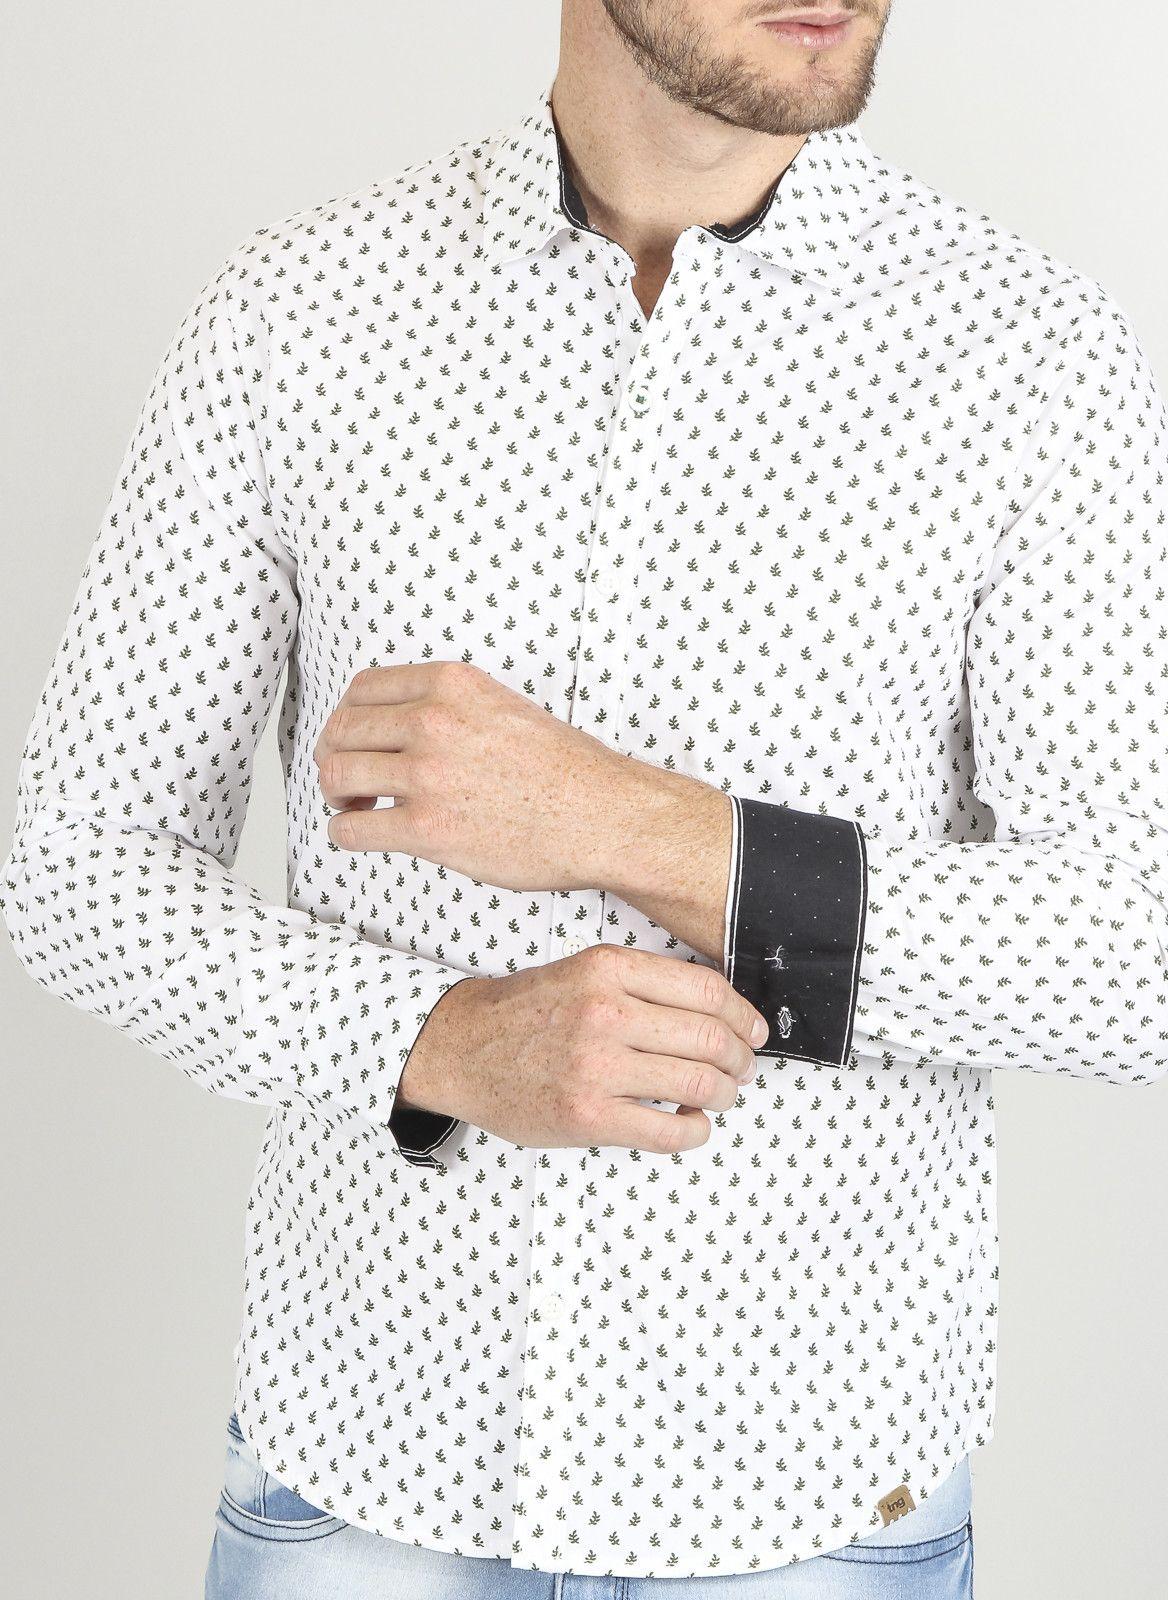 TNG LO CAMISA EST LEAF BR-BRANCO - Camisas - Masculino  971315d3081ad